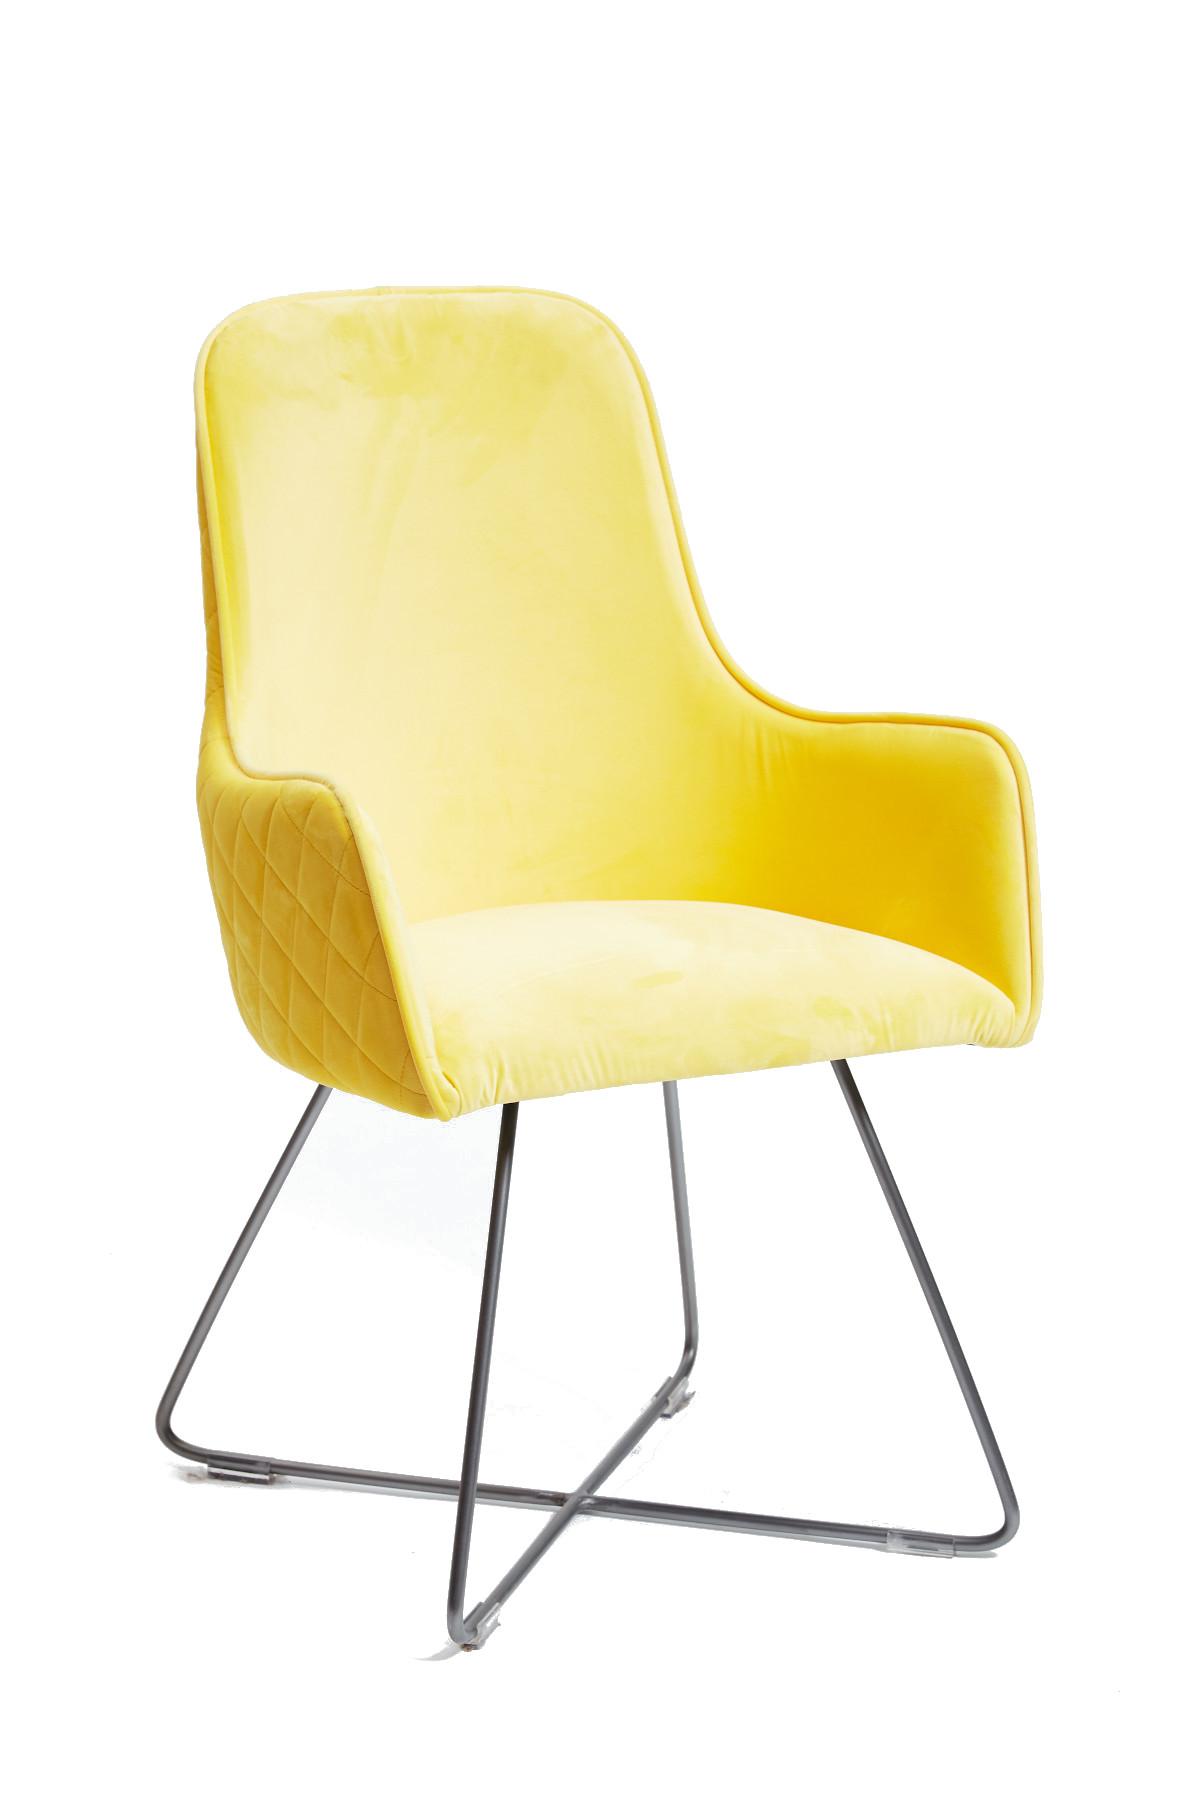 Utah Dining Chair - Lemon